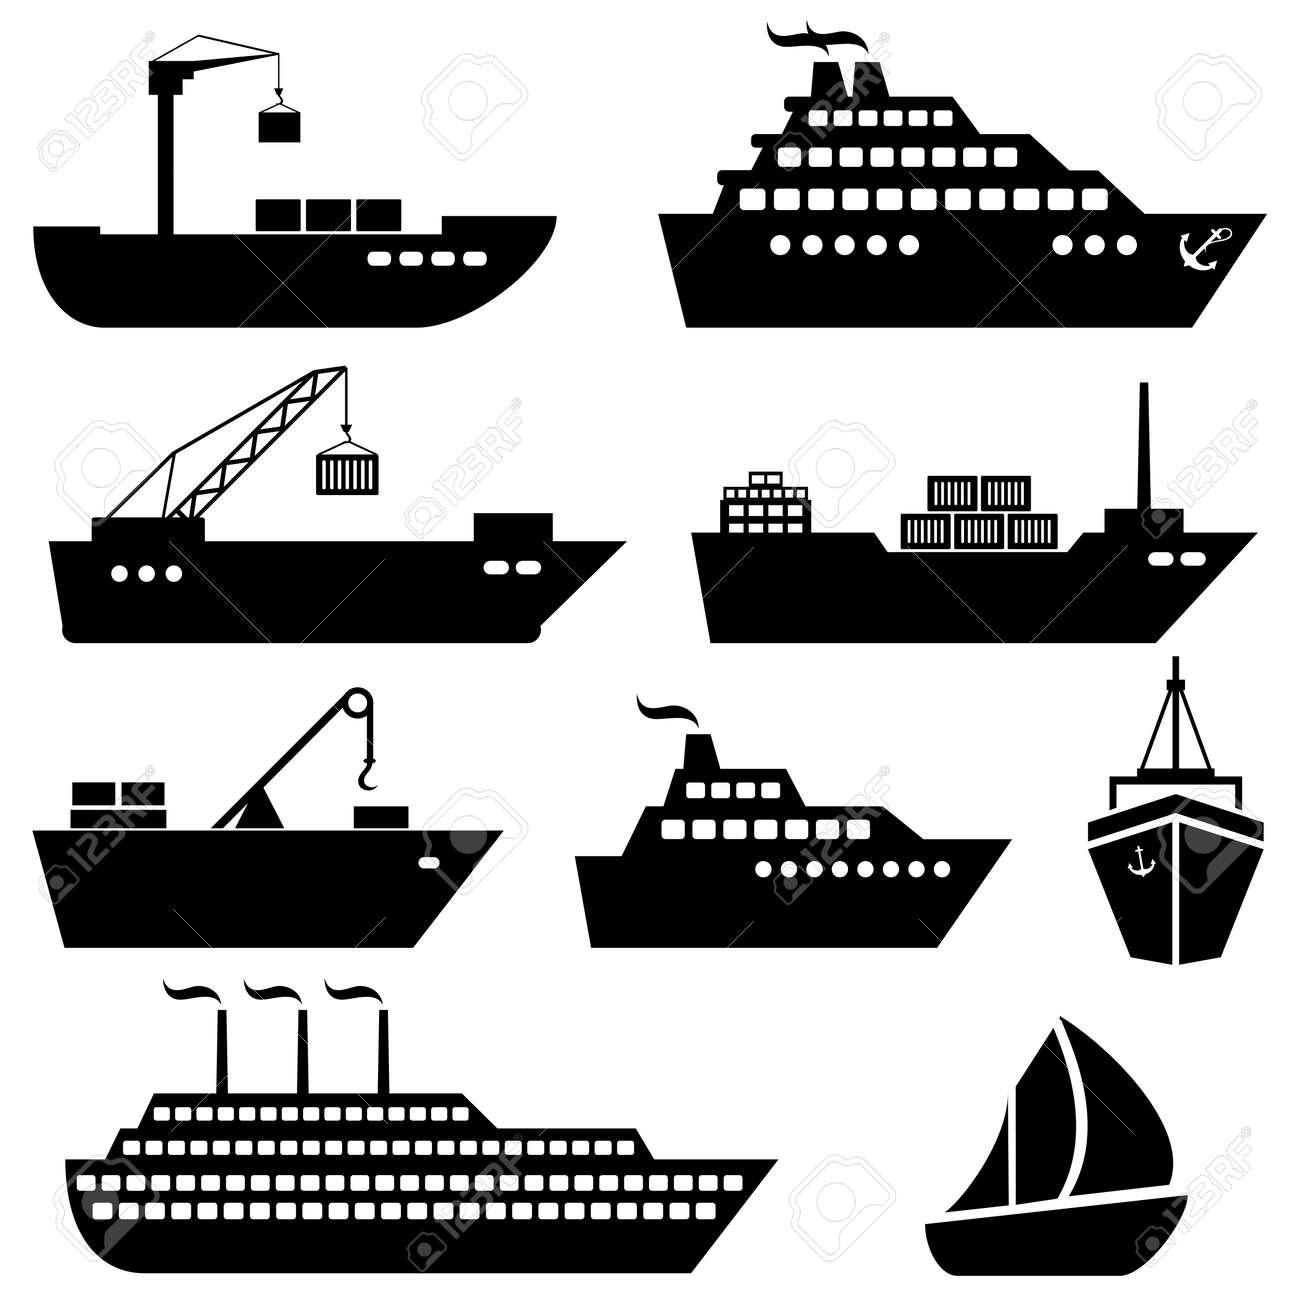 Ships, boats, cargo, logistics, transportation and shipping icons - 30768354